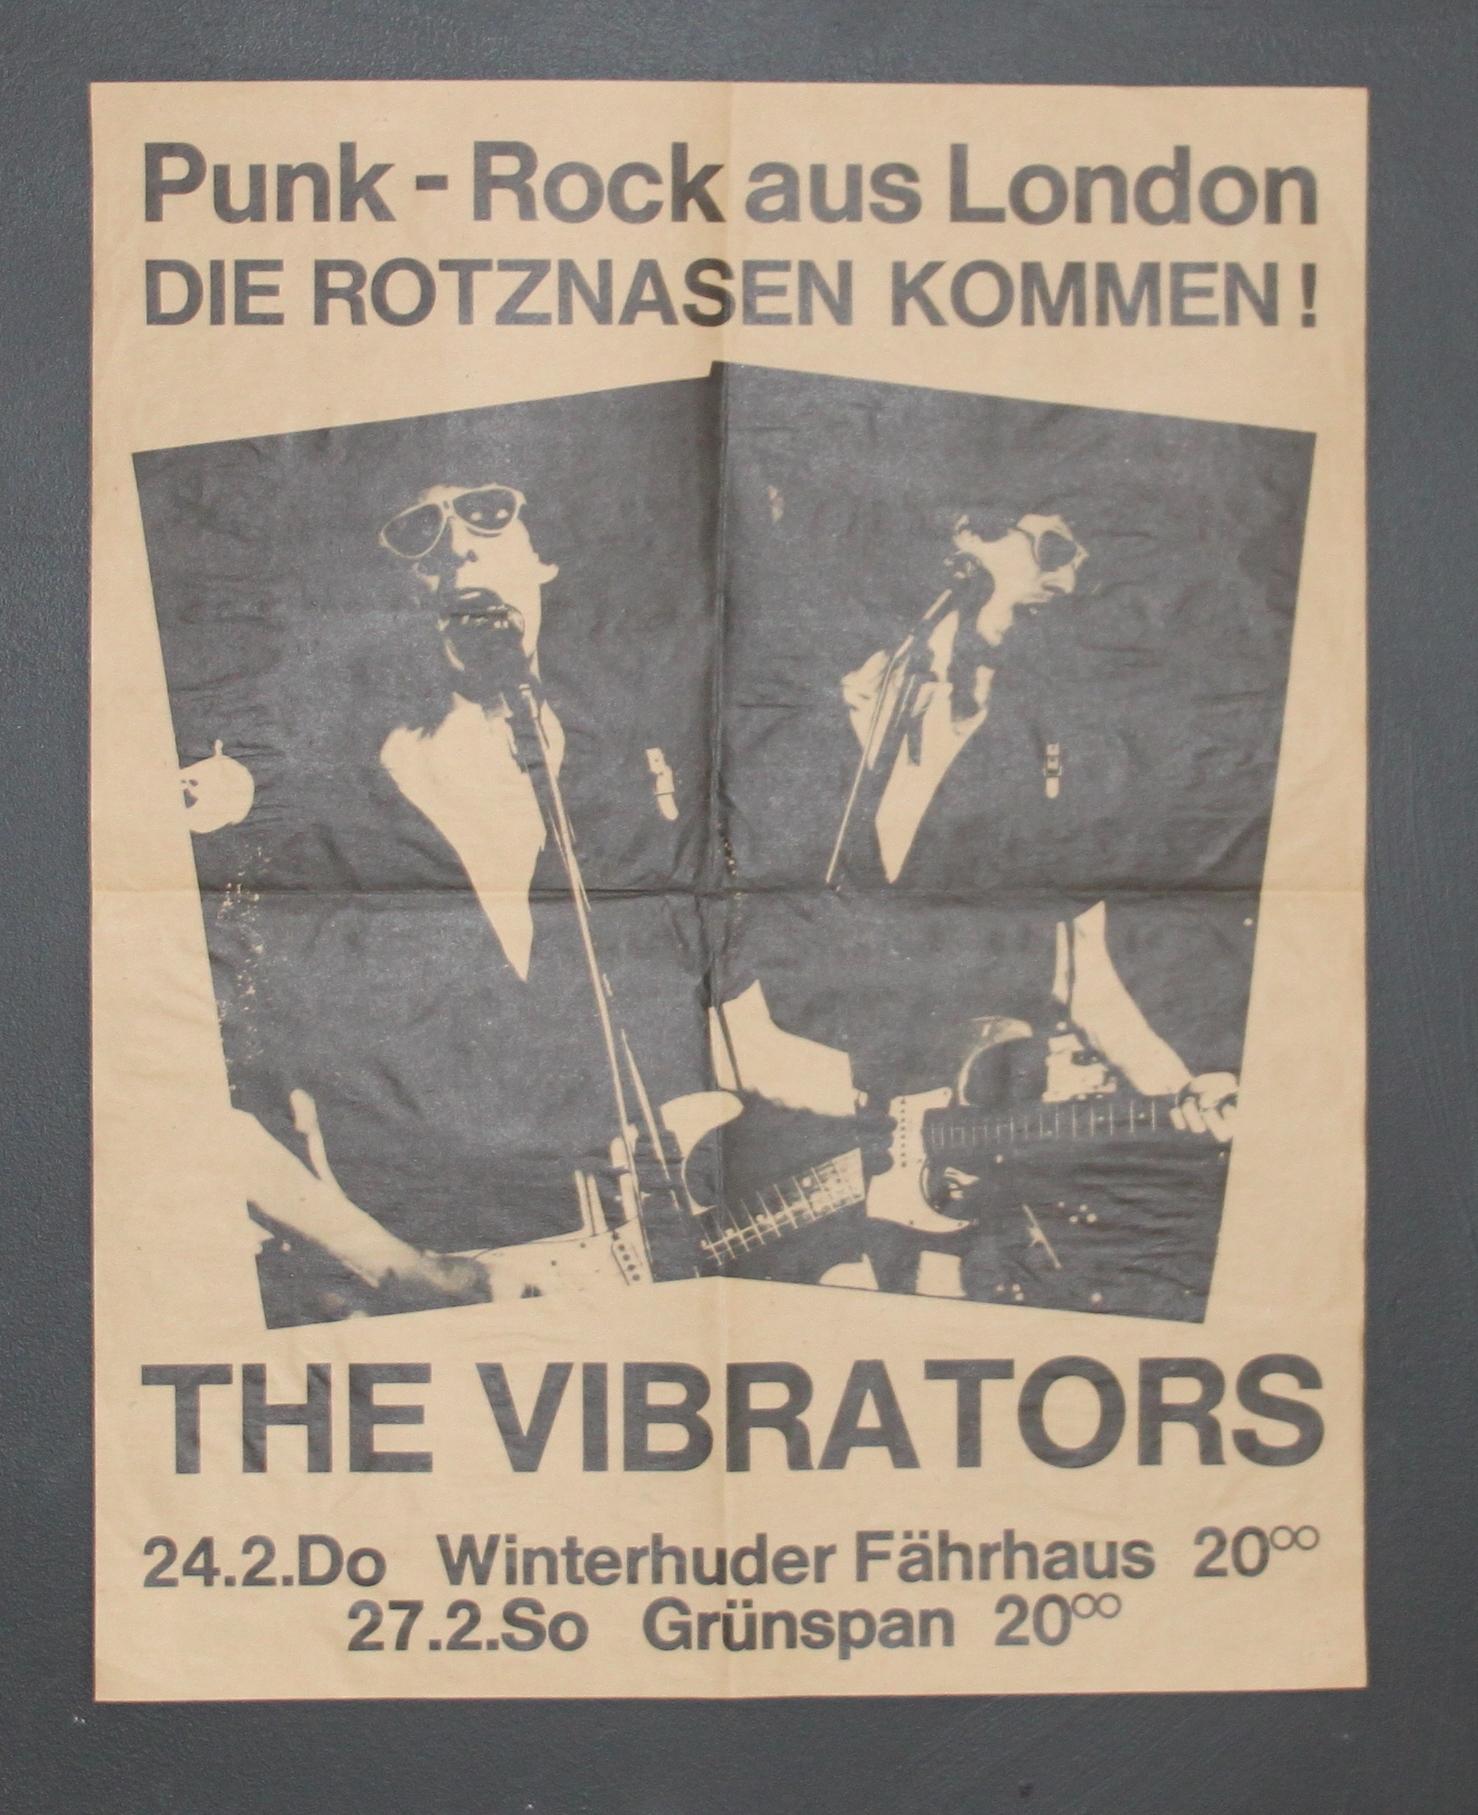 VIBRATORS FEB 77 GERMANY - punk rock posters